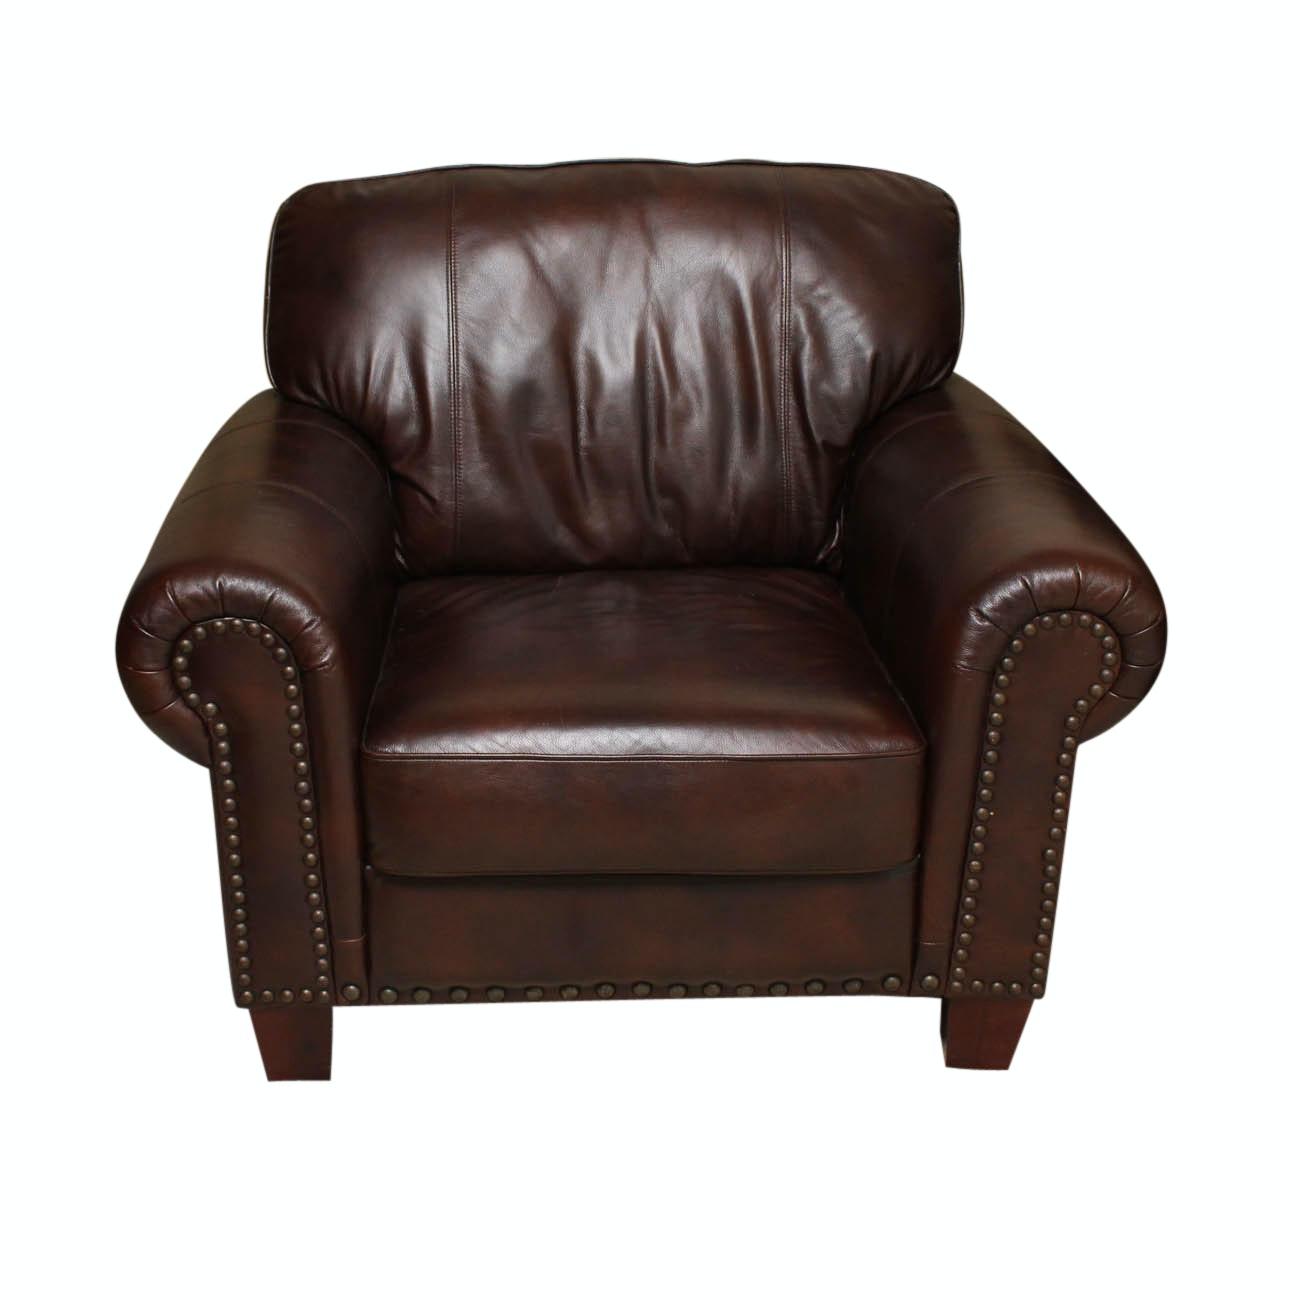 Oversized Leather Armchair